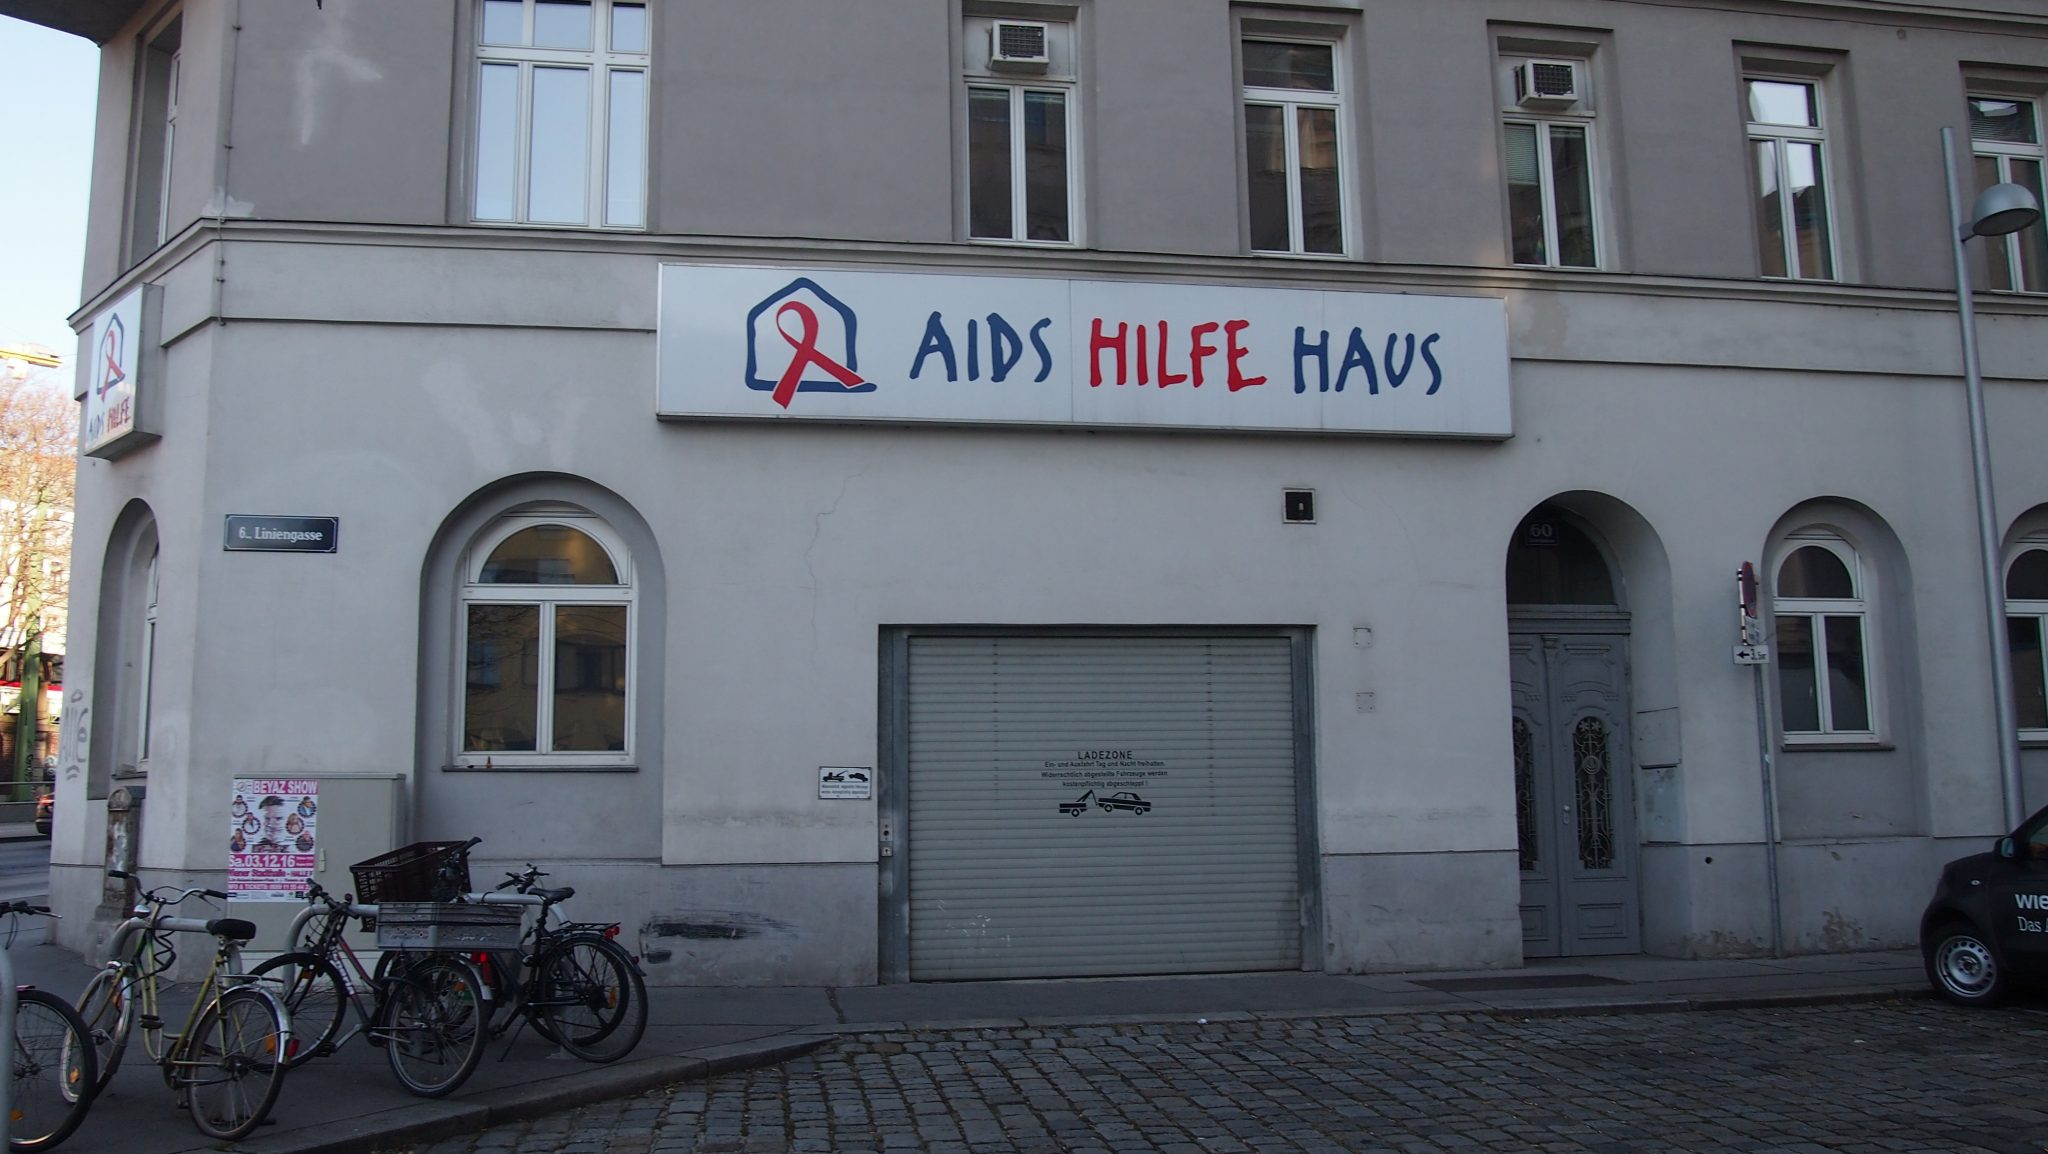 HIV Aids Hilfe Haus Wien